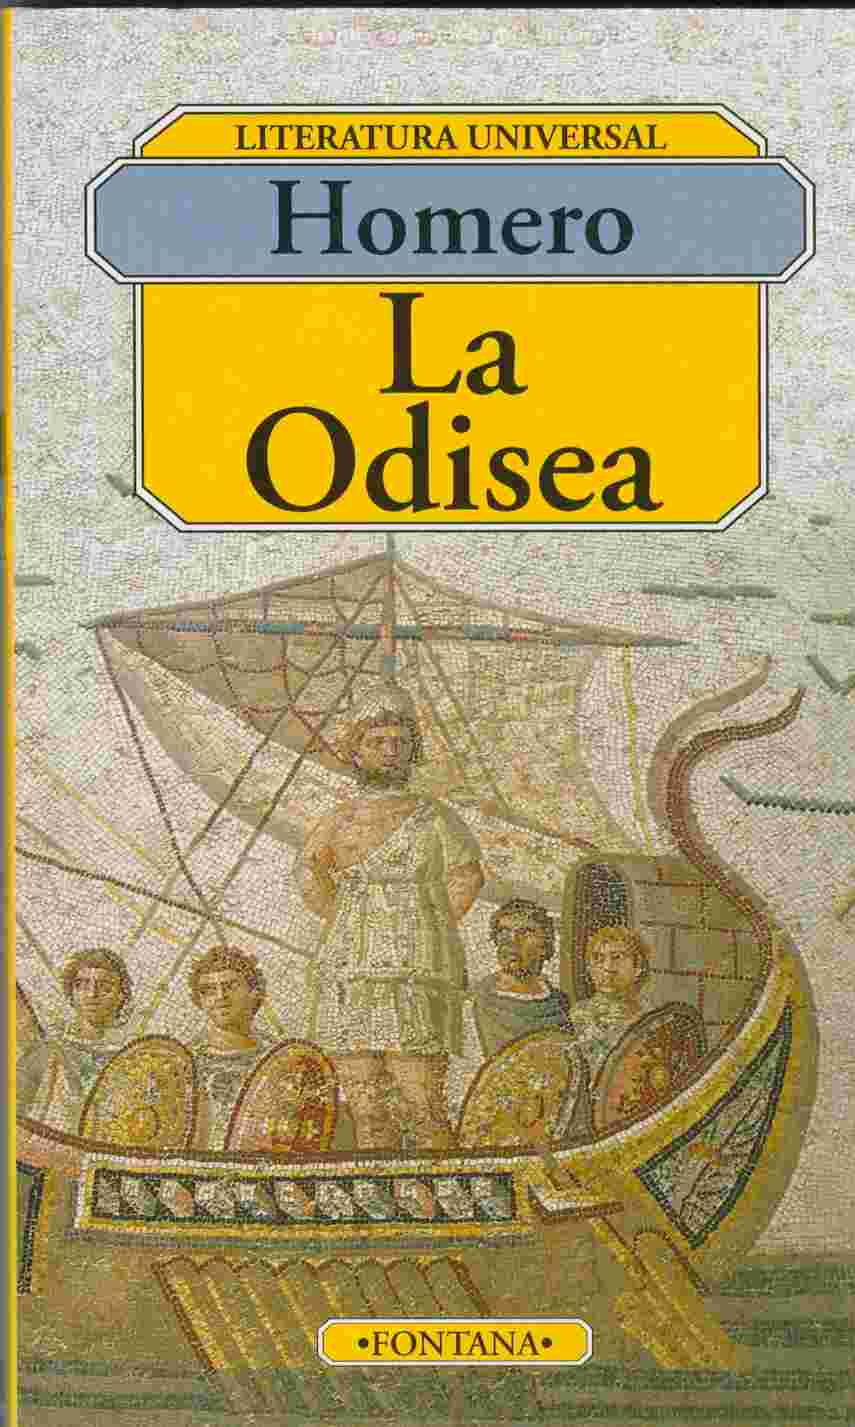 90. The Odyssey